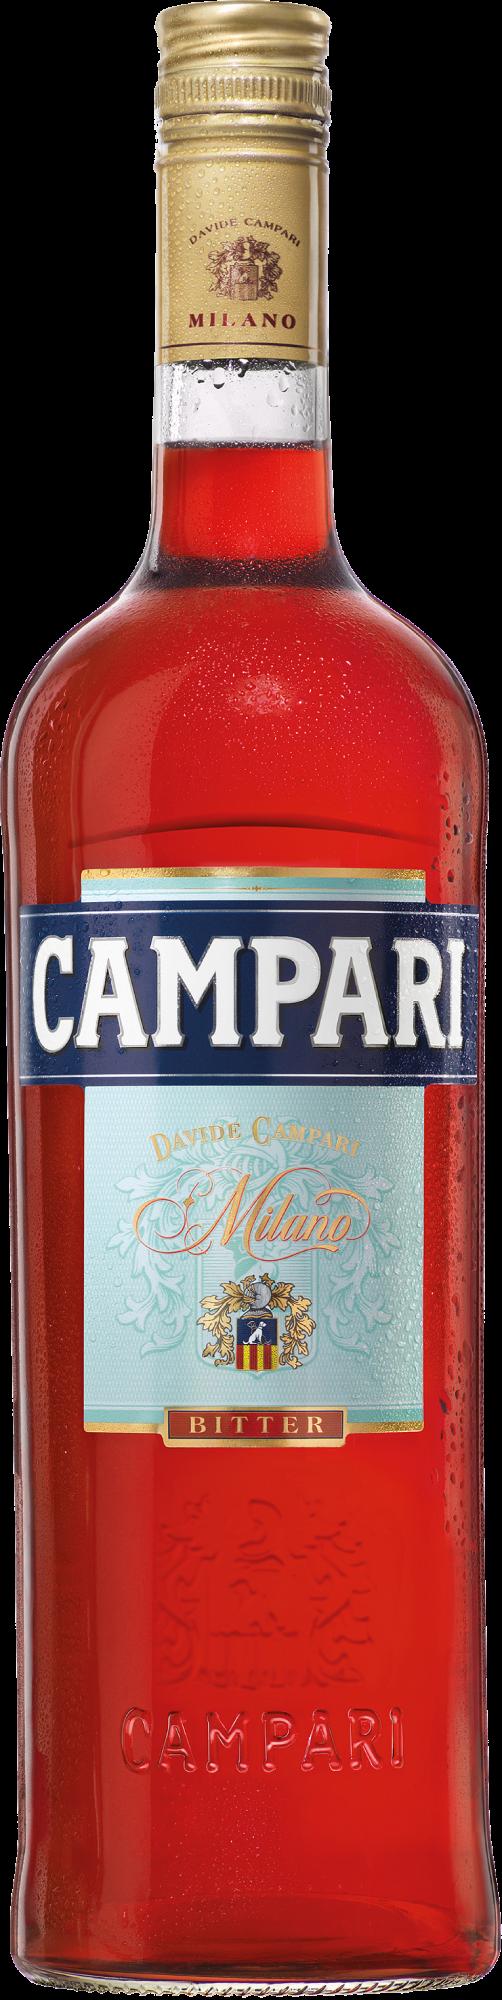 Campari Bitter 0.5л склад магазин winewine